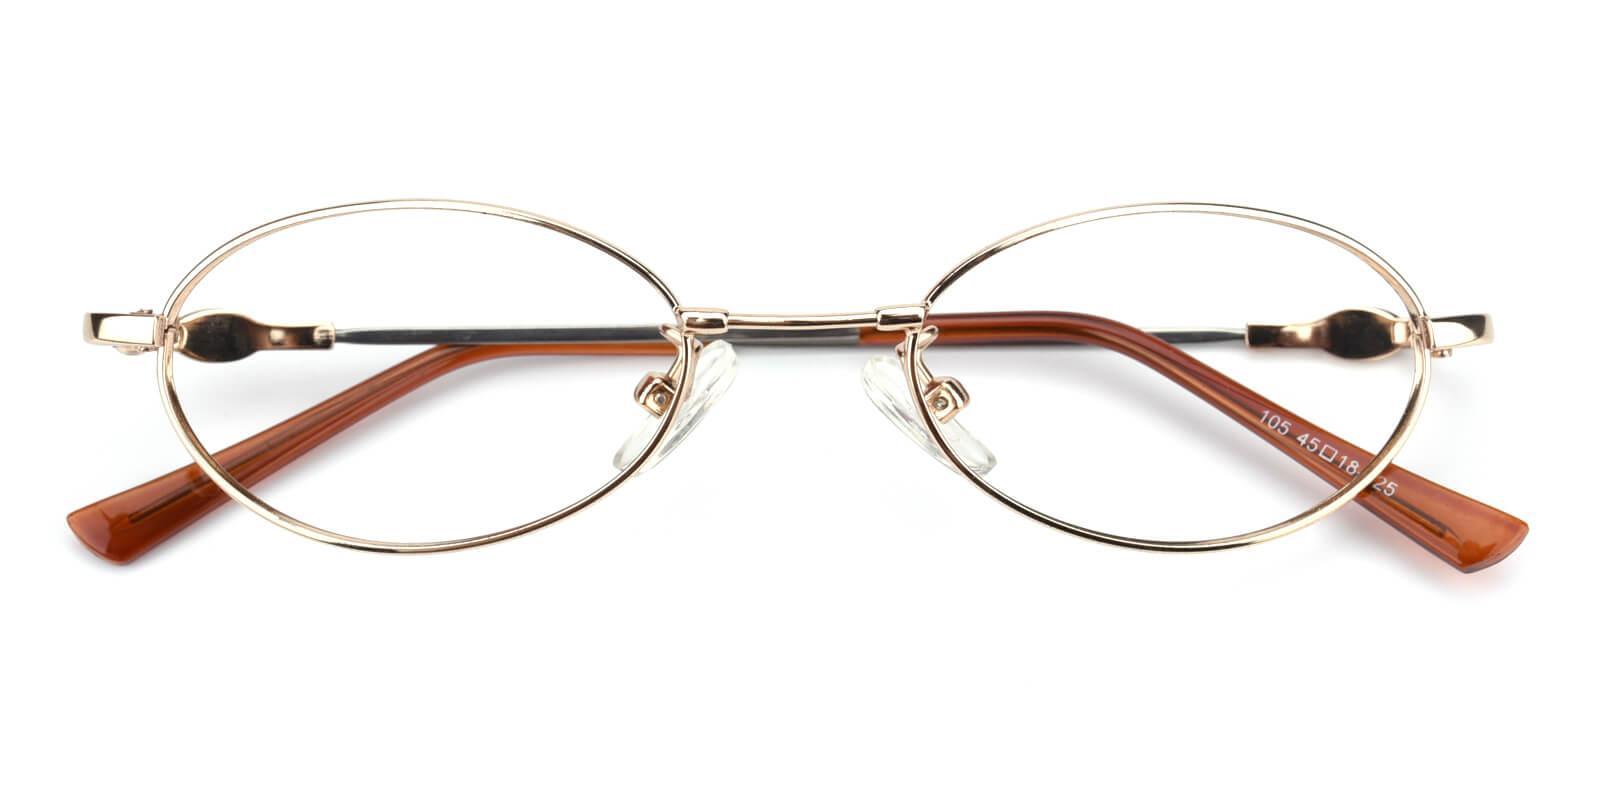 Mikestar-Gold-Oval-Titanium-Eyeglasses-detail